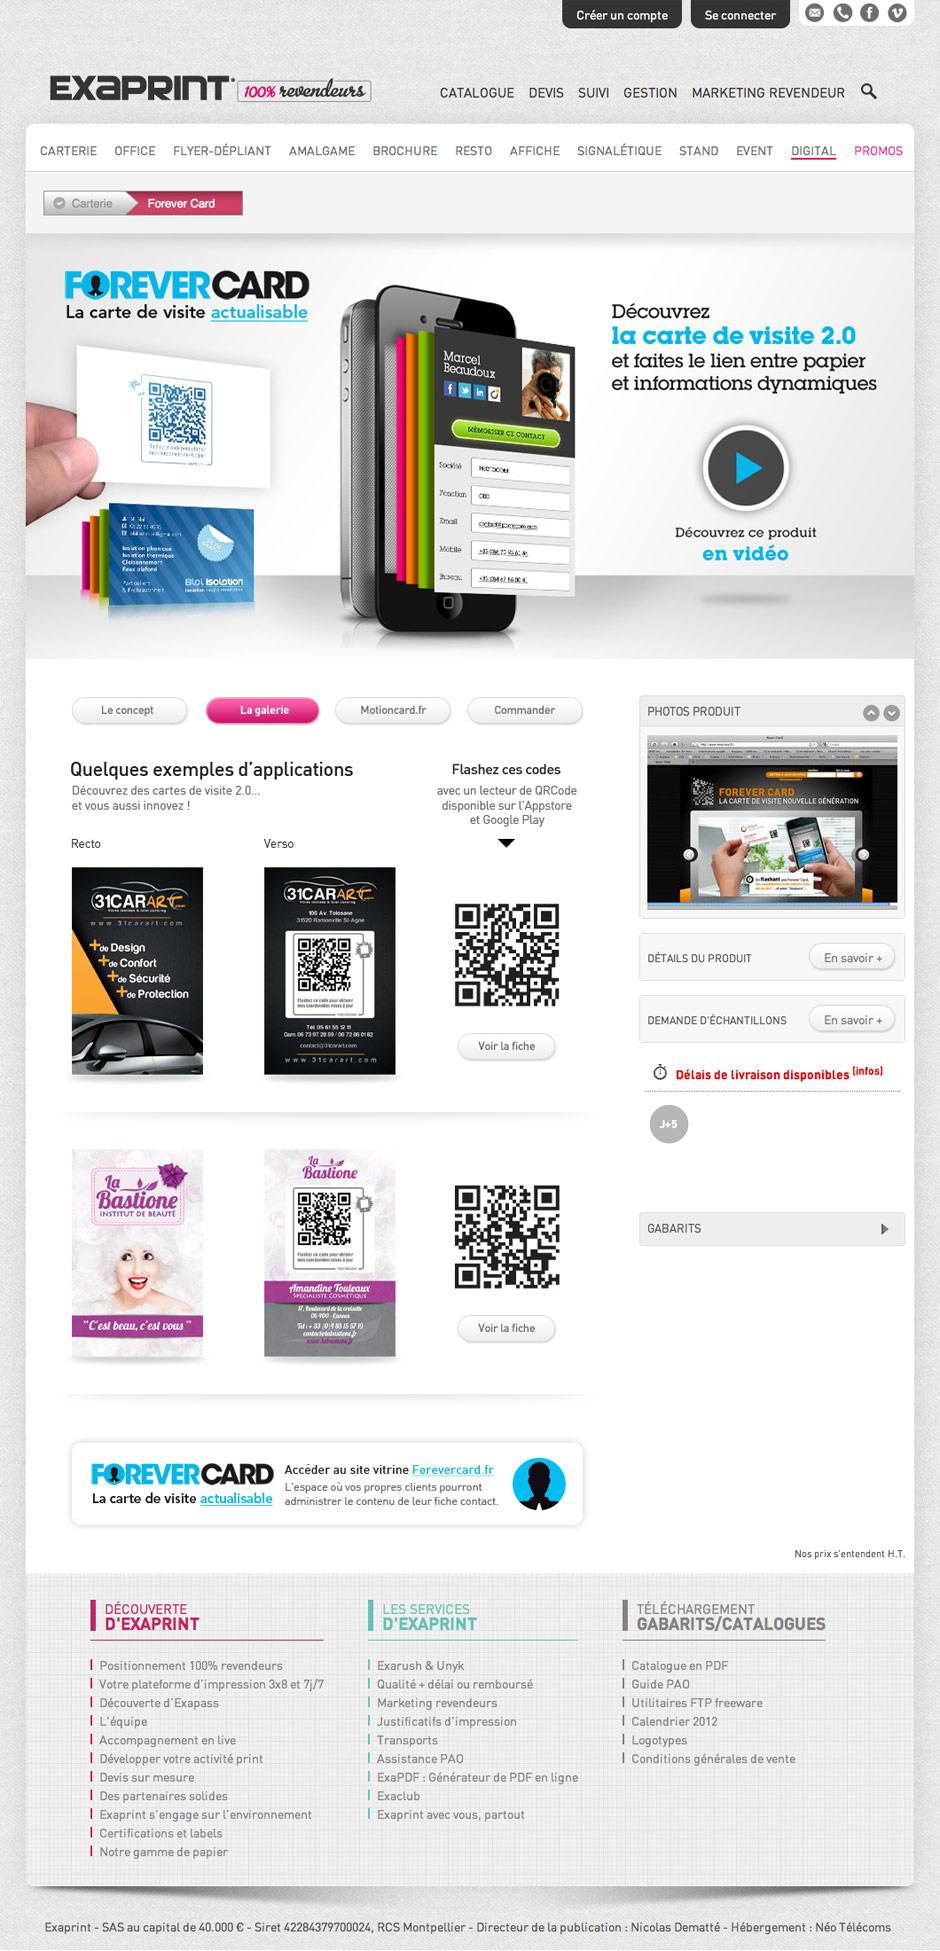 graphiste-montpellier-creation-exaprint-forevercard-agence-communication-montpellier-caconcept-alexis-cretin-3